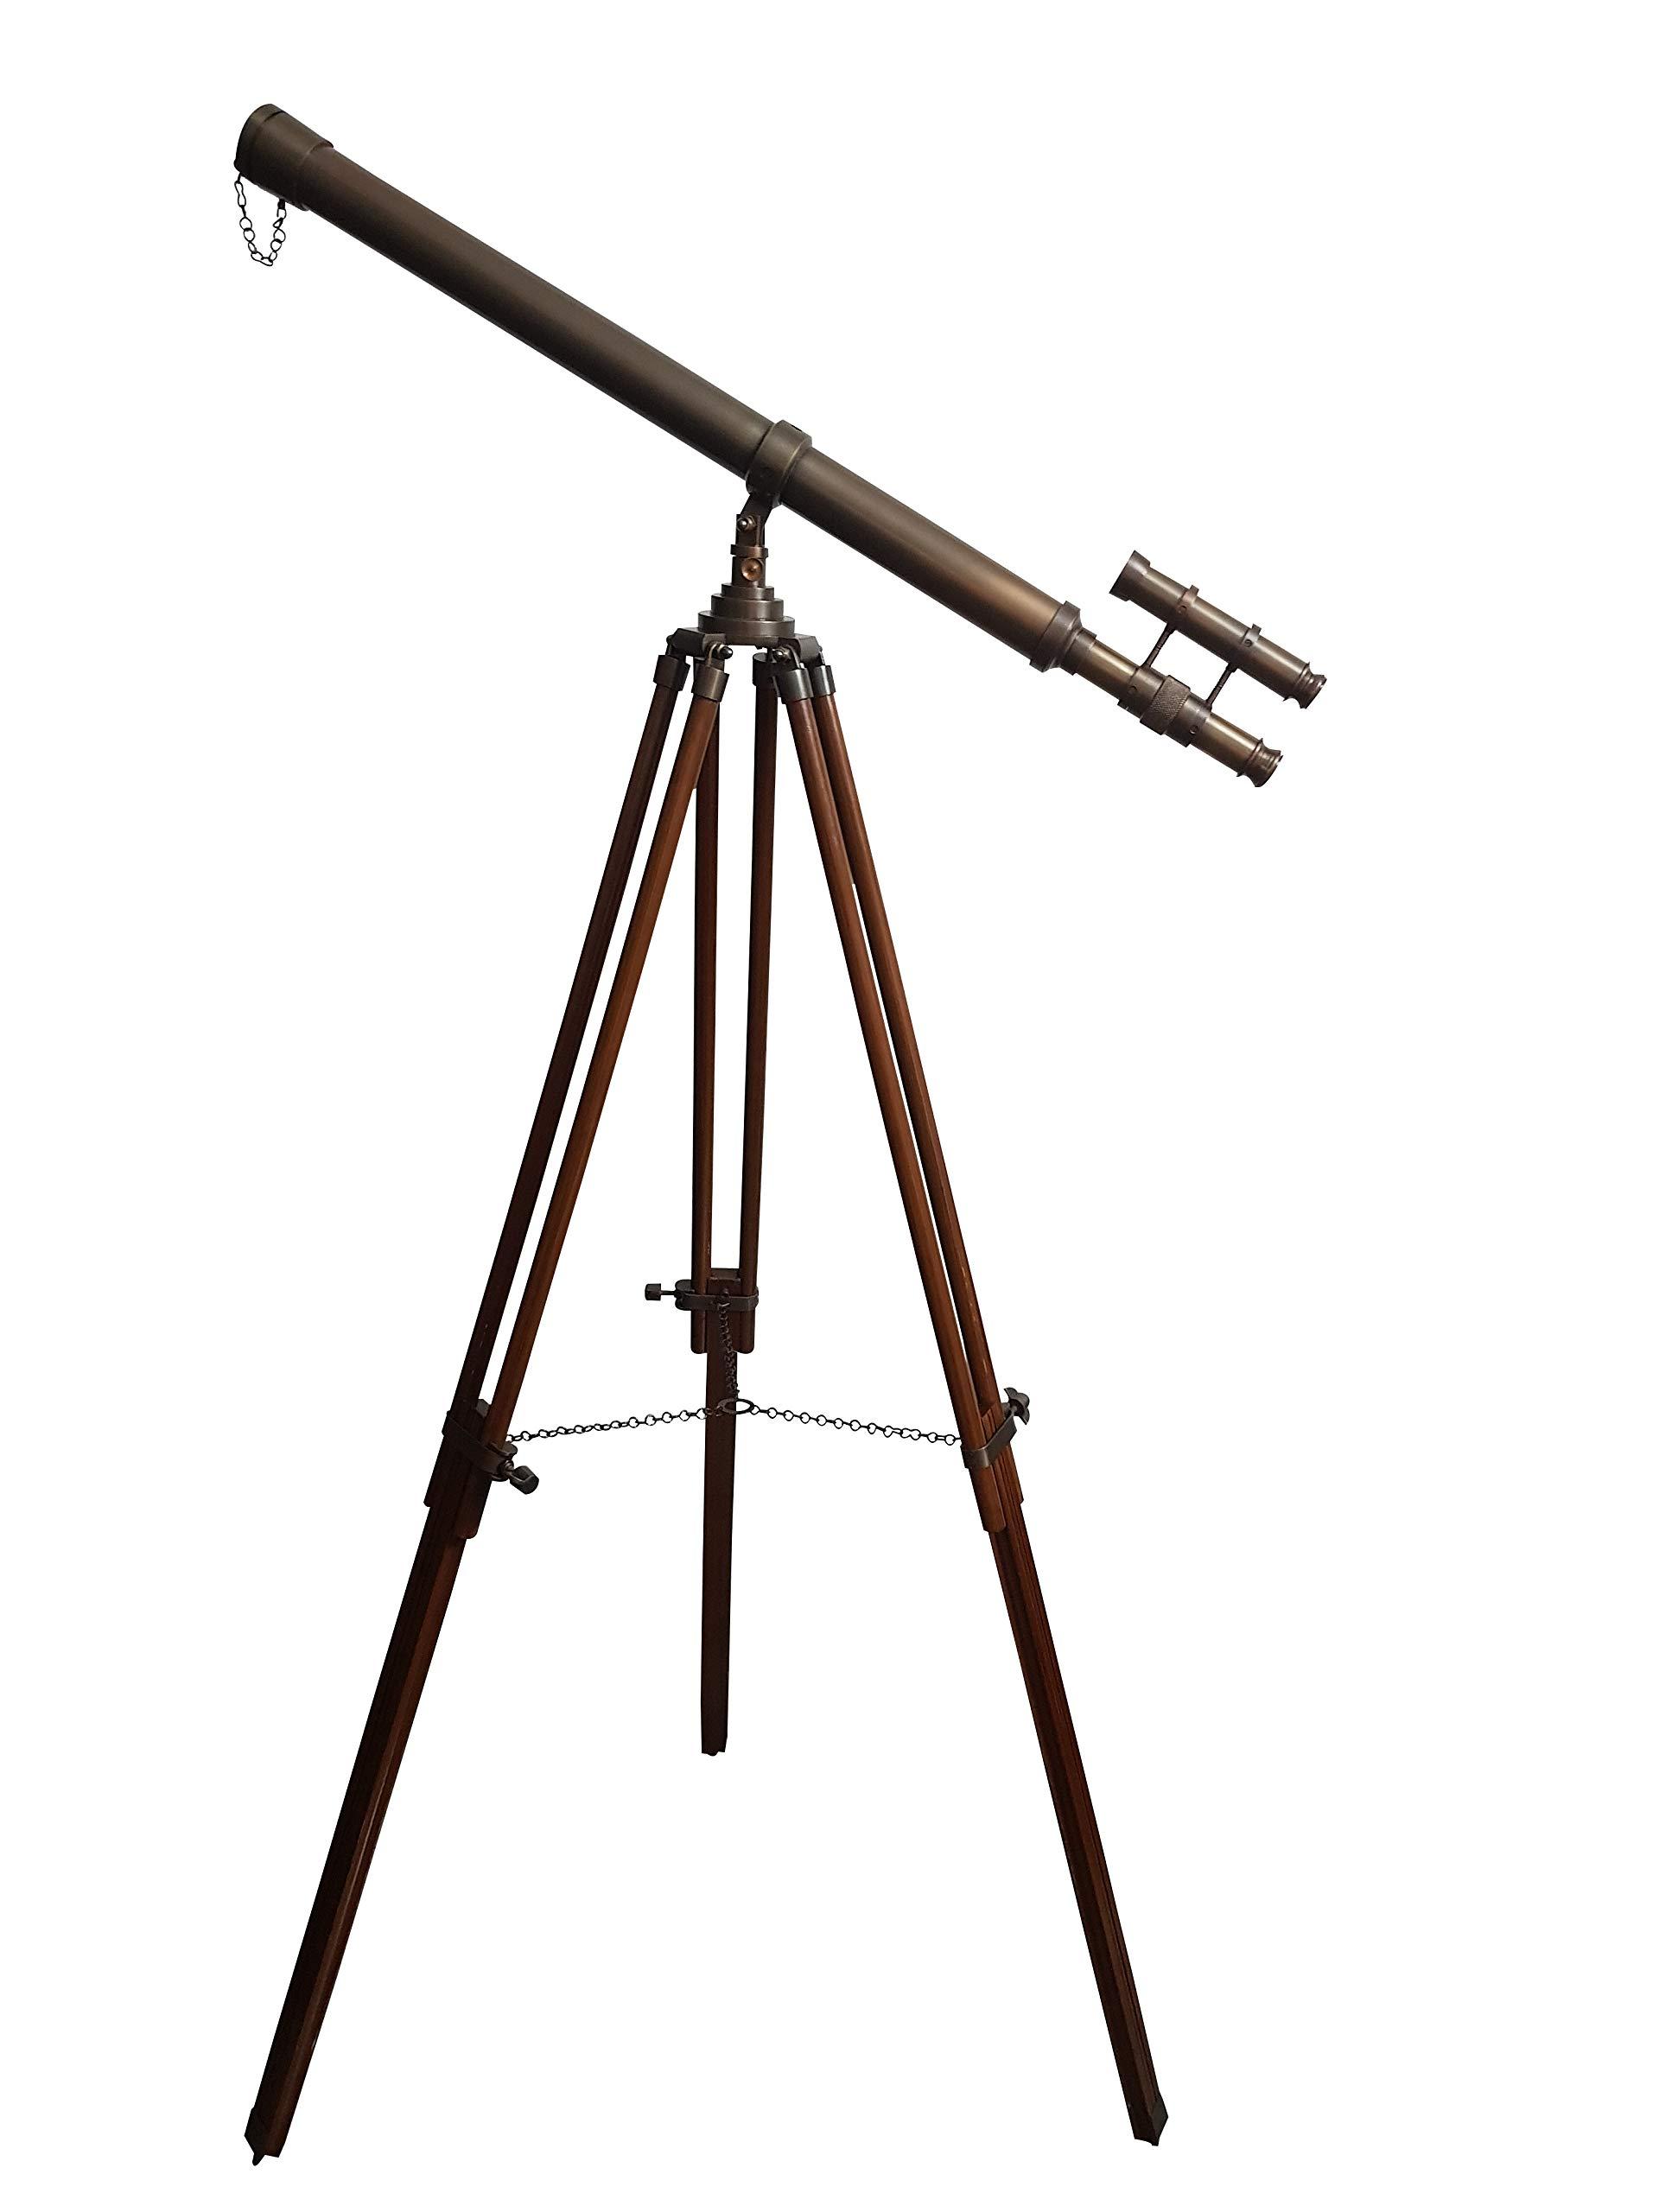 CollectiblesBuy Antique Metal Floor Standing Tripod Base Telescope Nautical Gift Master Harbor Maritime Scope Retro